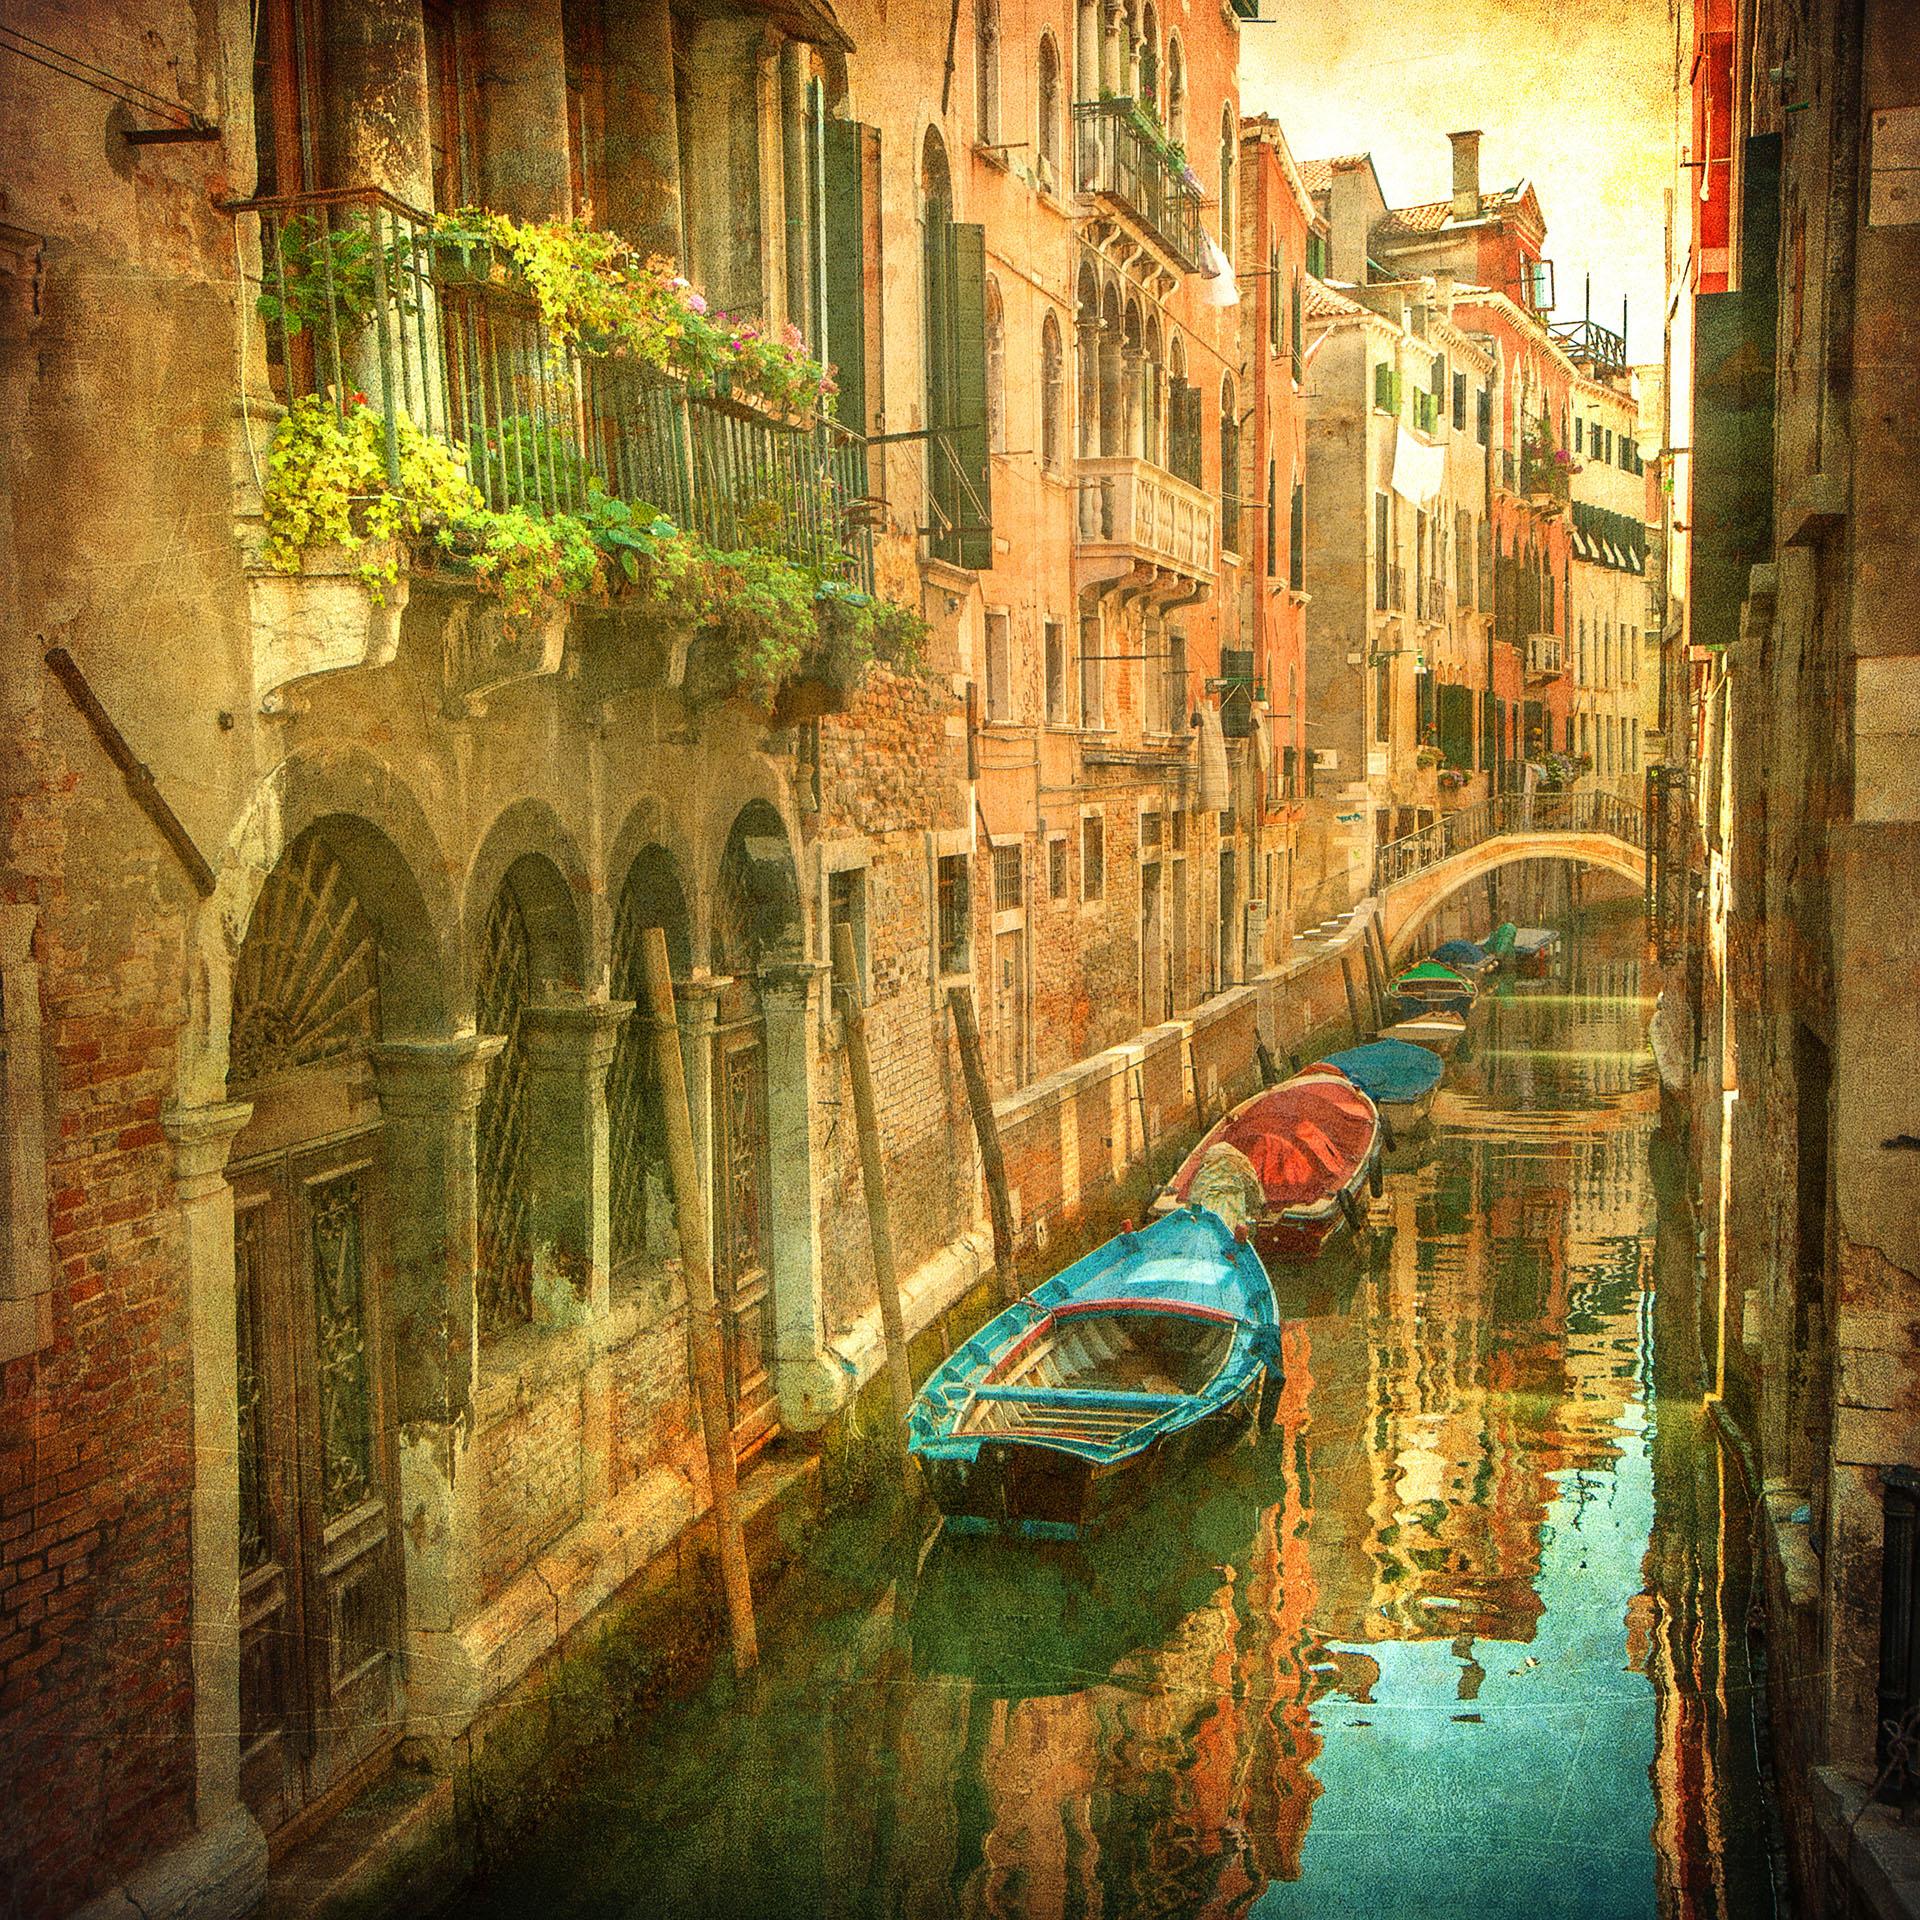 Vintage Venice Canal Italy Photo Wallpaper Wall Mural CN 156P eBay 1920x1920